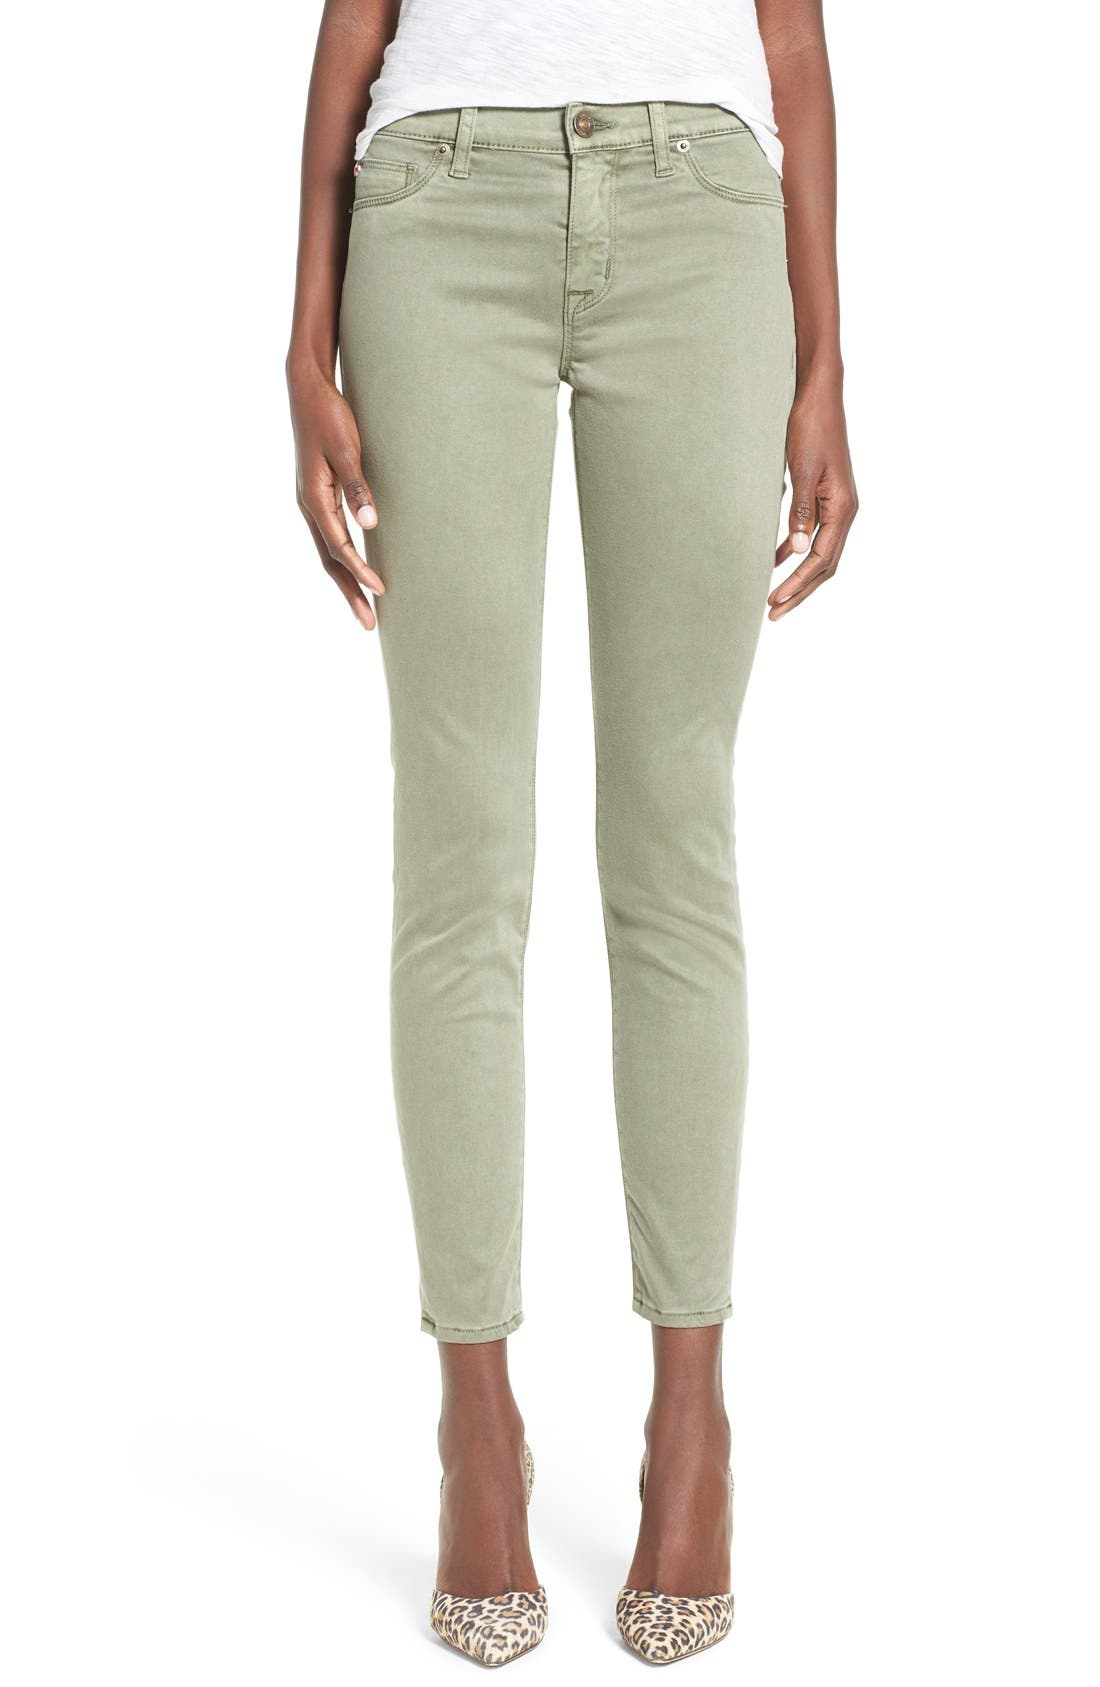 Alternate Image 1 Selected - Hudson Jeans 'Nico' Ankle Super Skinny Jeans (Earth Works)